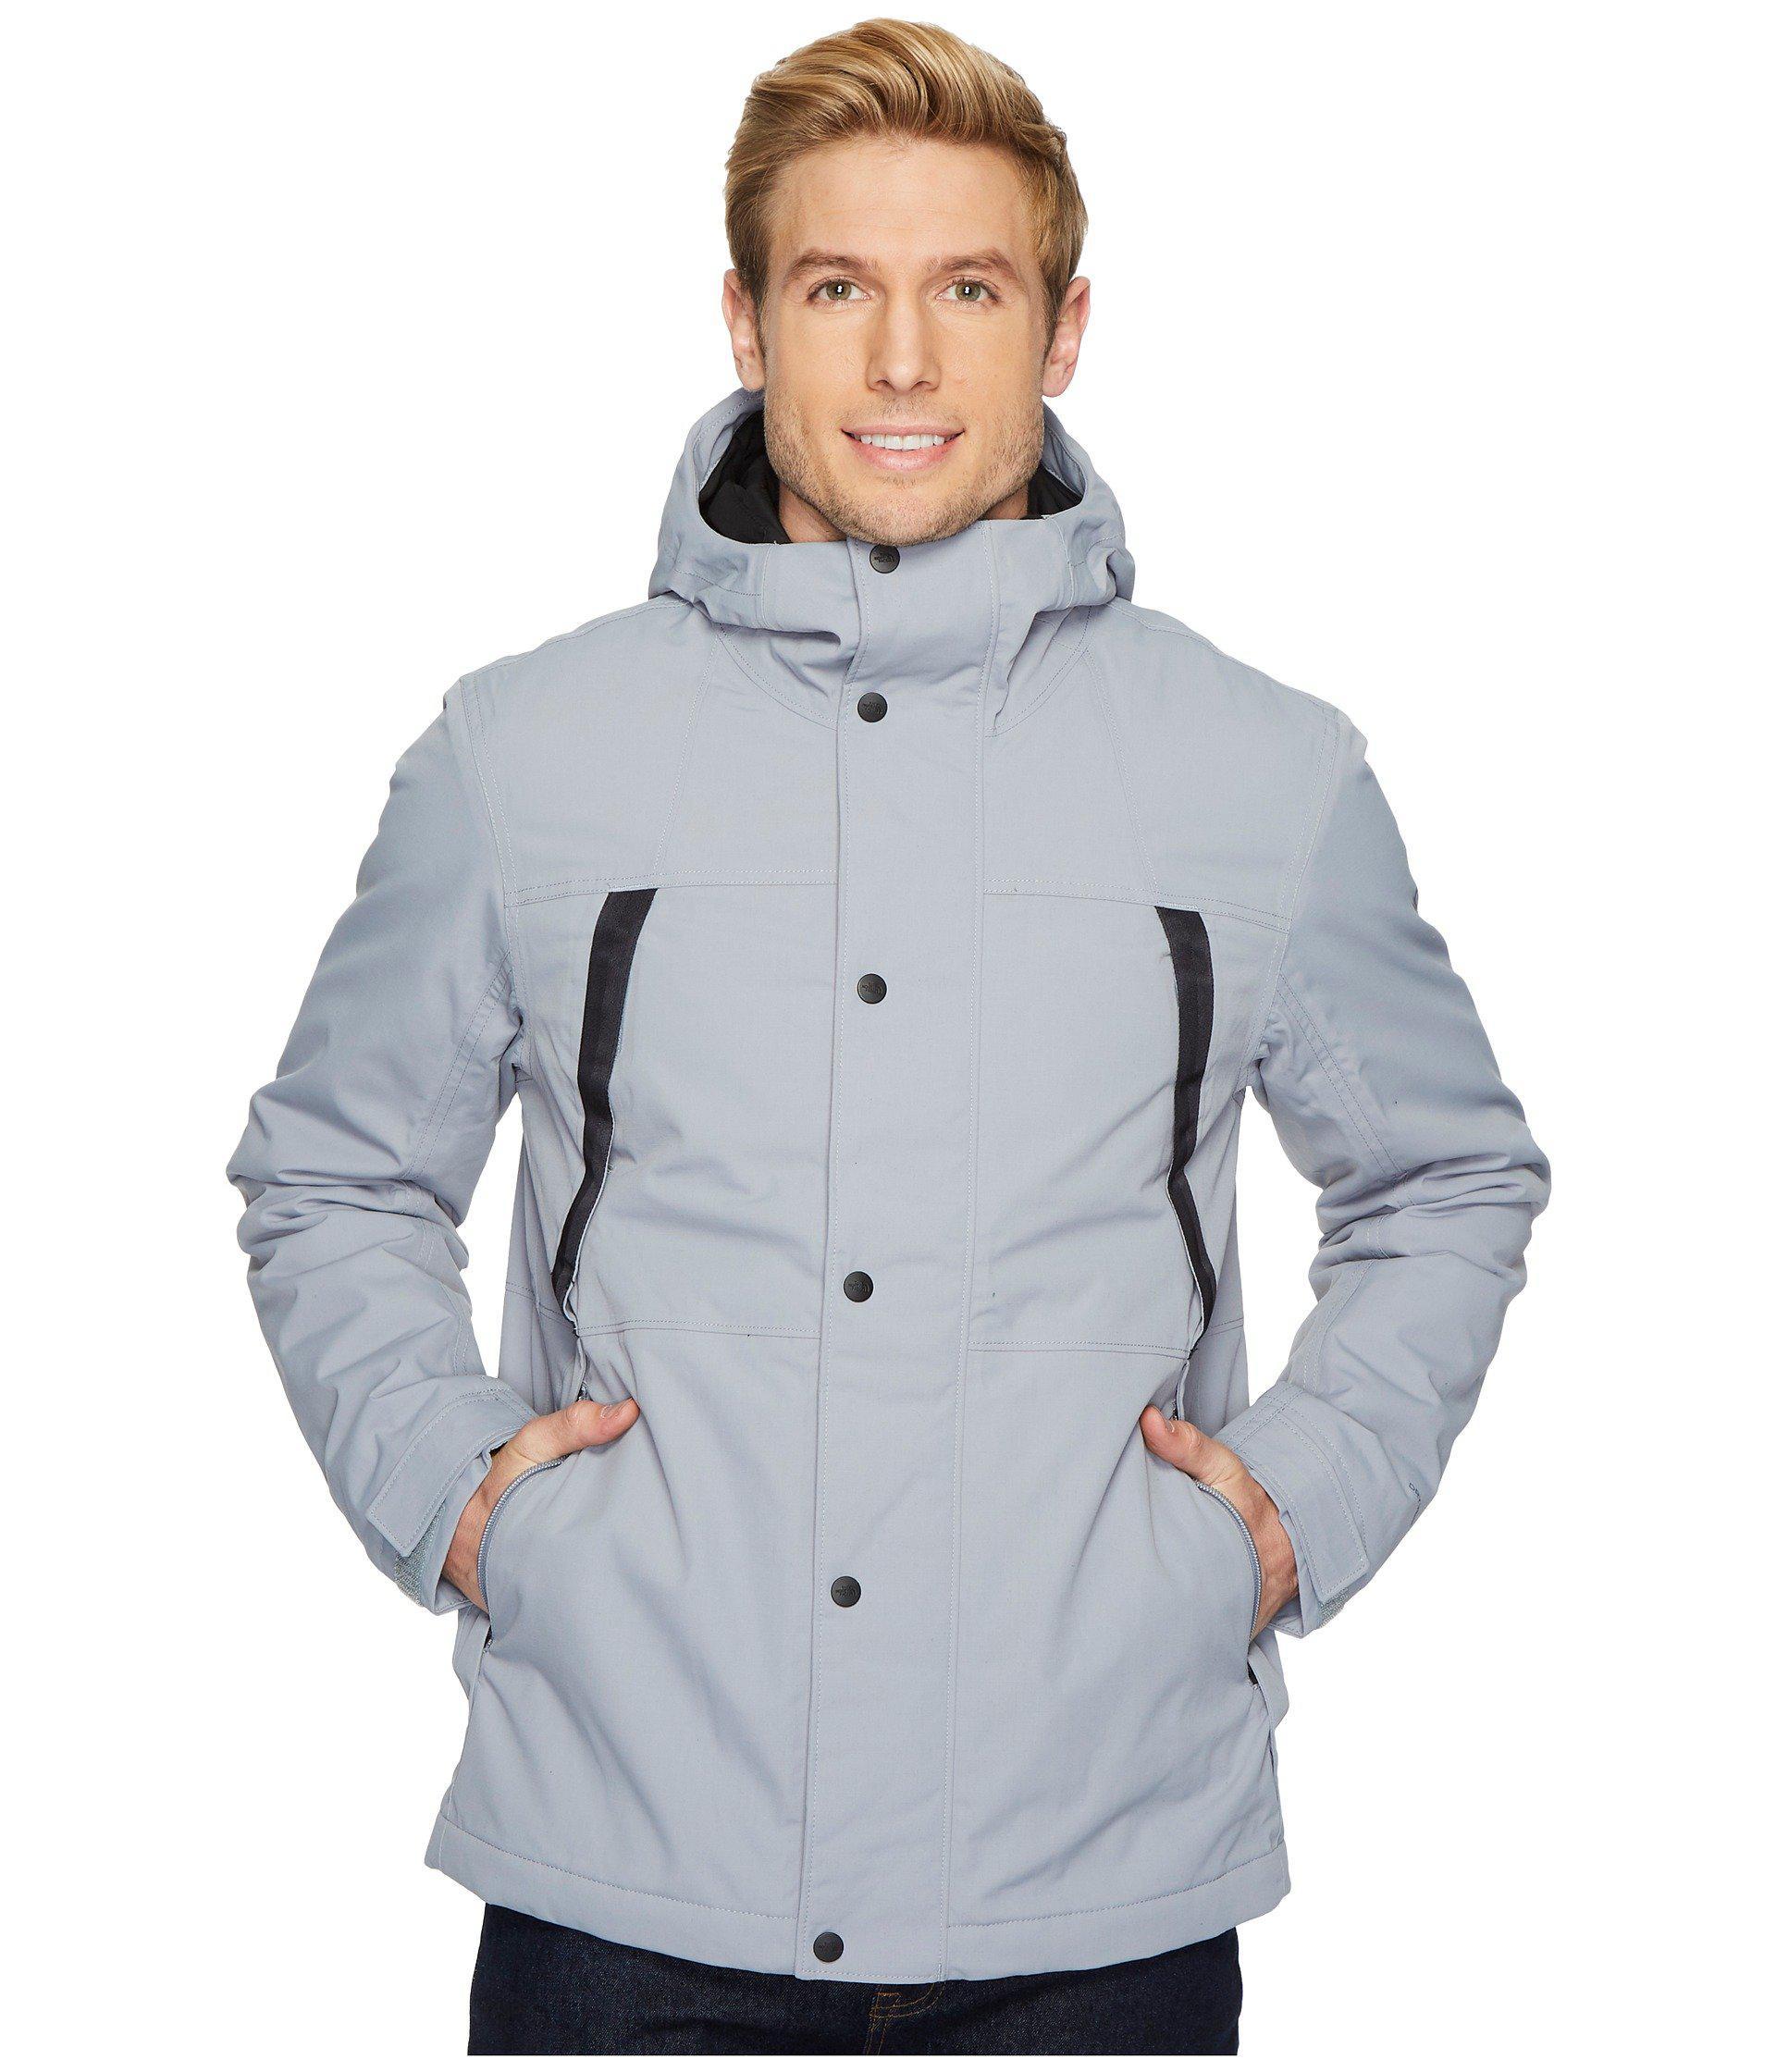 1a65f4d340da ... promo code for the north face. mens gray stetler insulated rain jacket  c973d 7ab9a